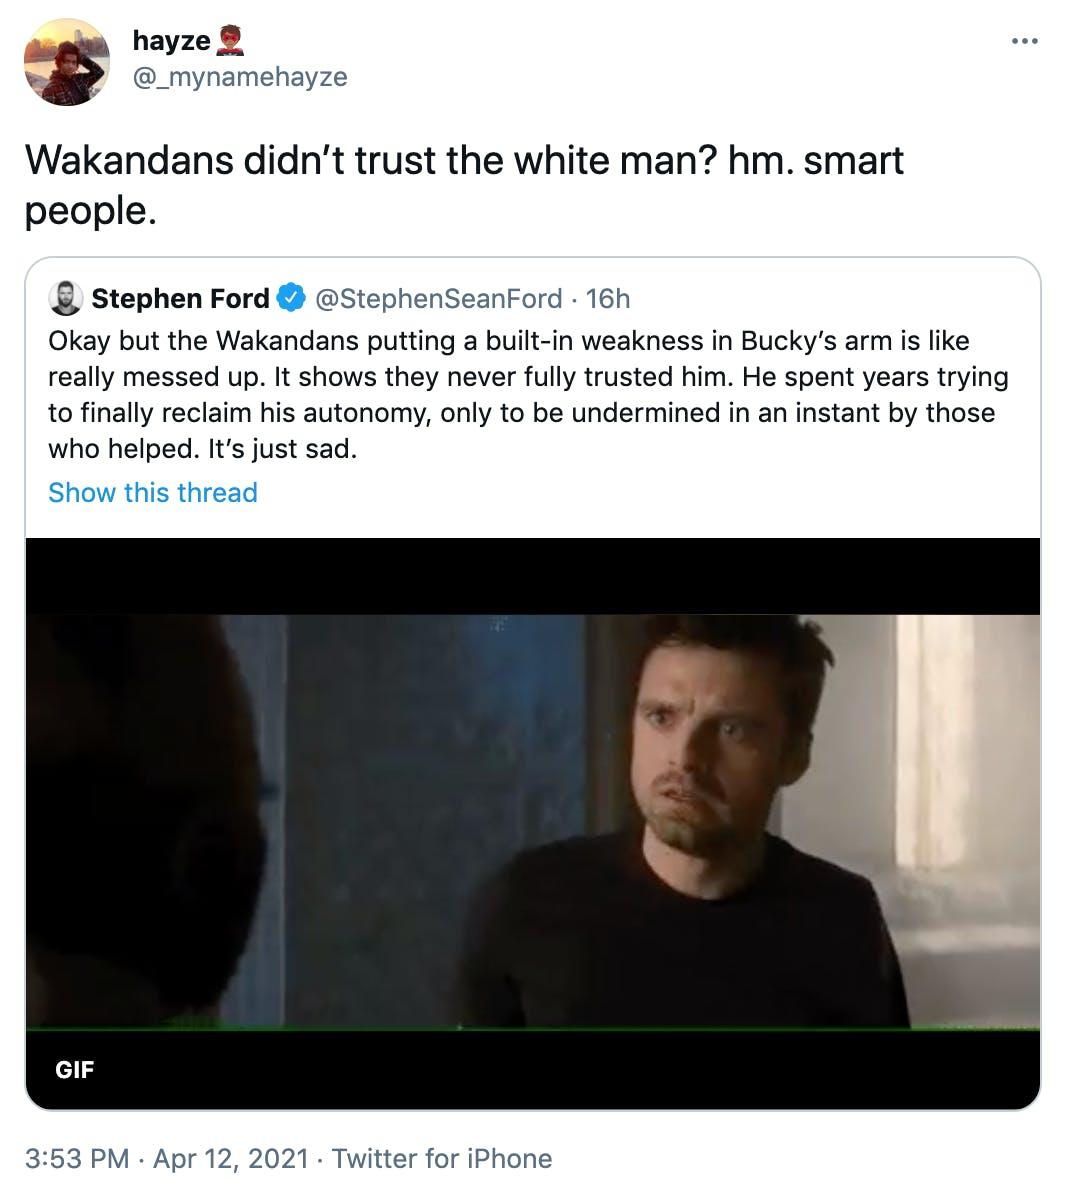 Wakandans didn't trust the white man? hm. smart people.